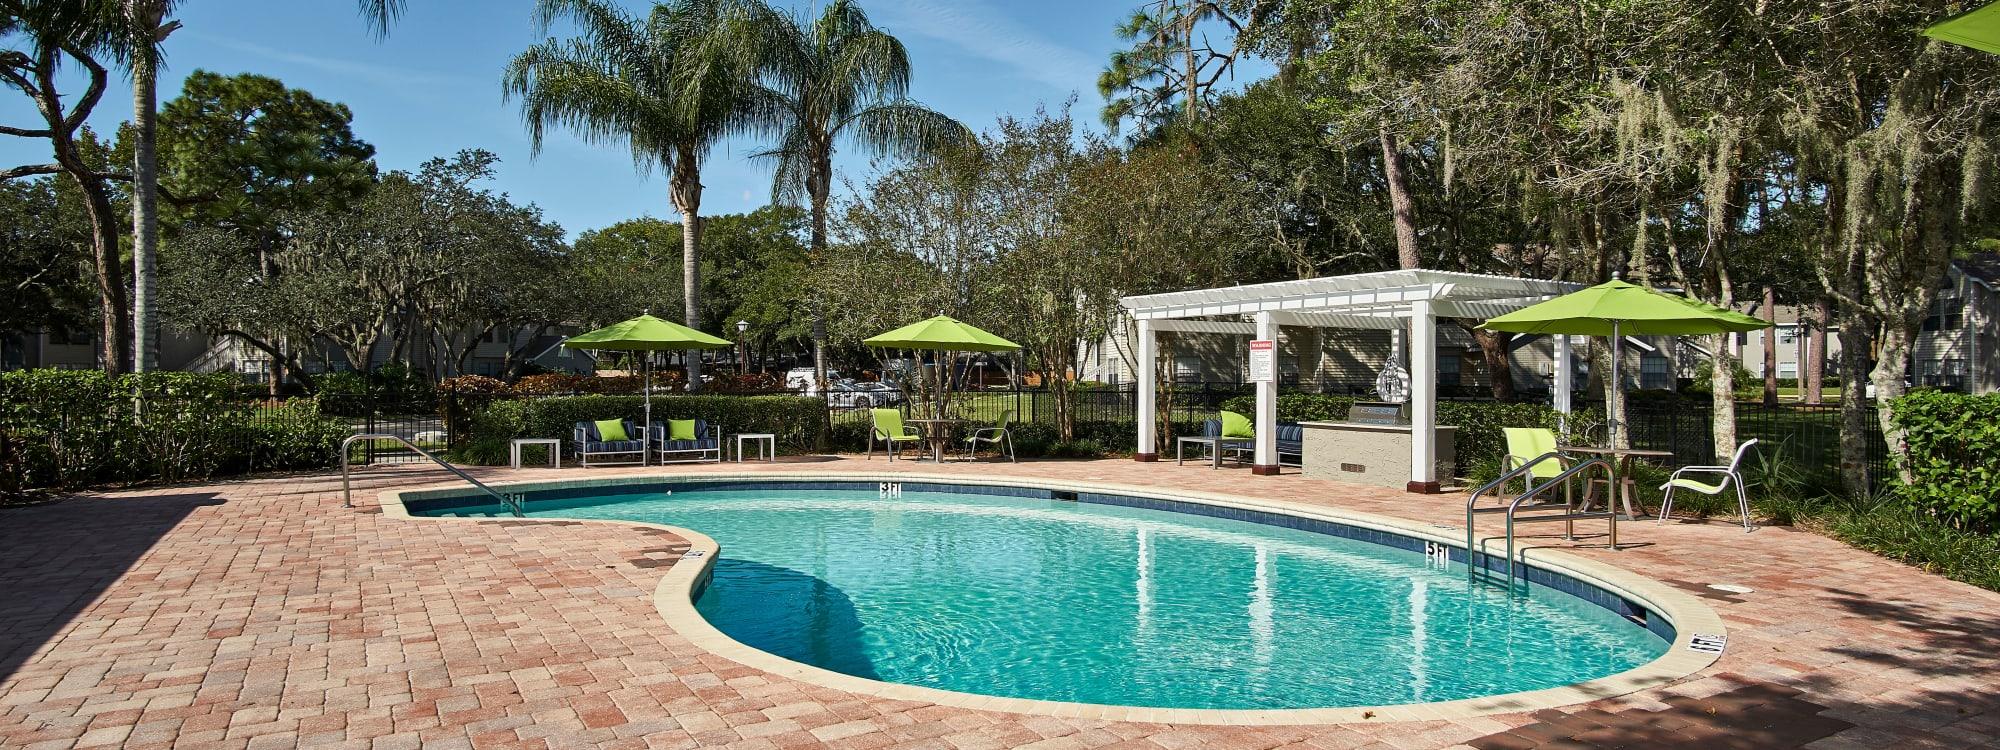 Amenities at Avenue @Creekbridge in Brandon, Florida